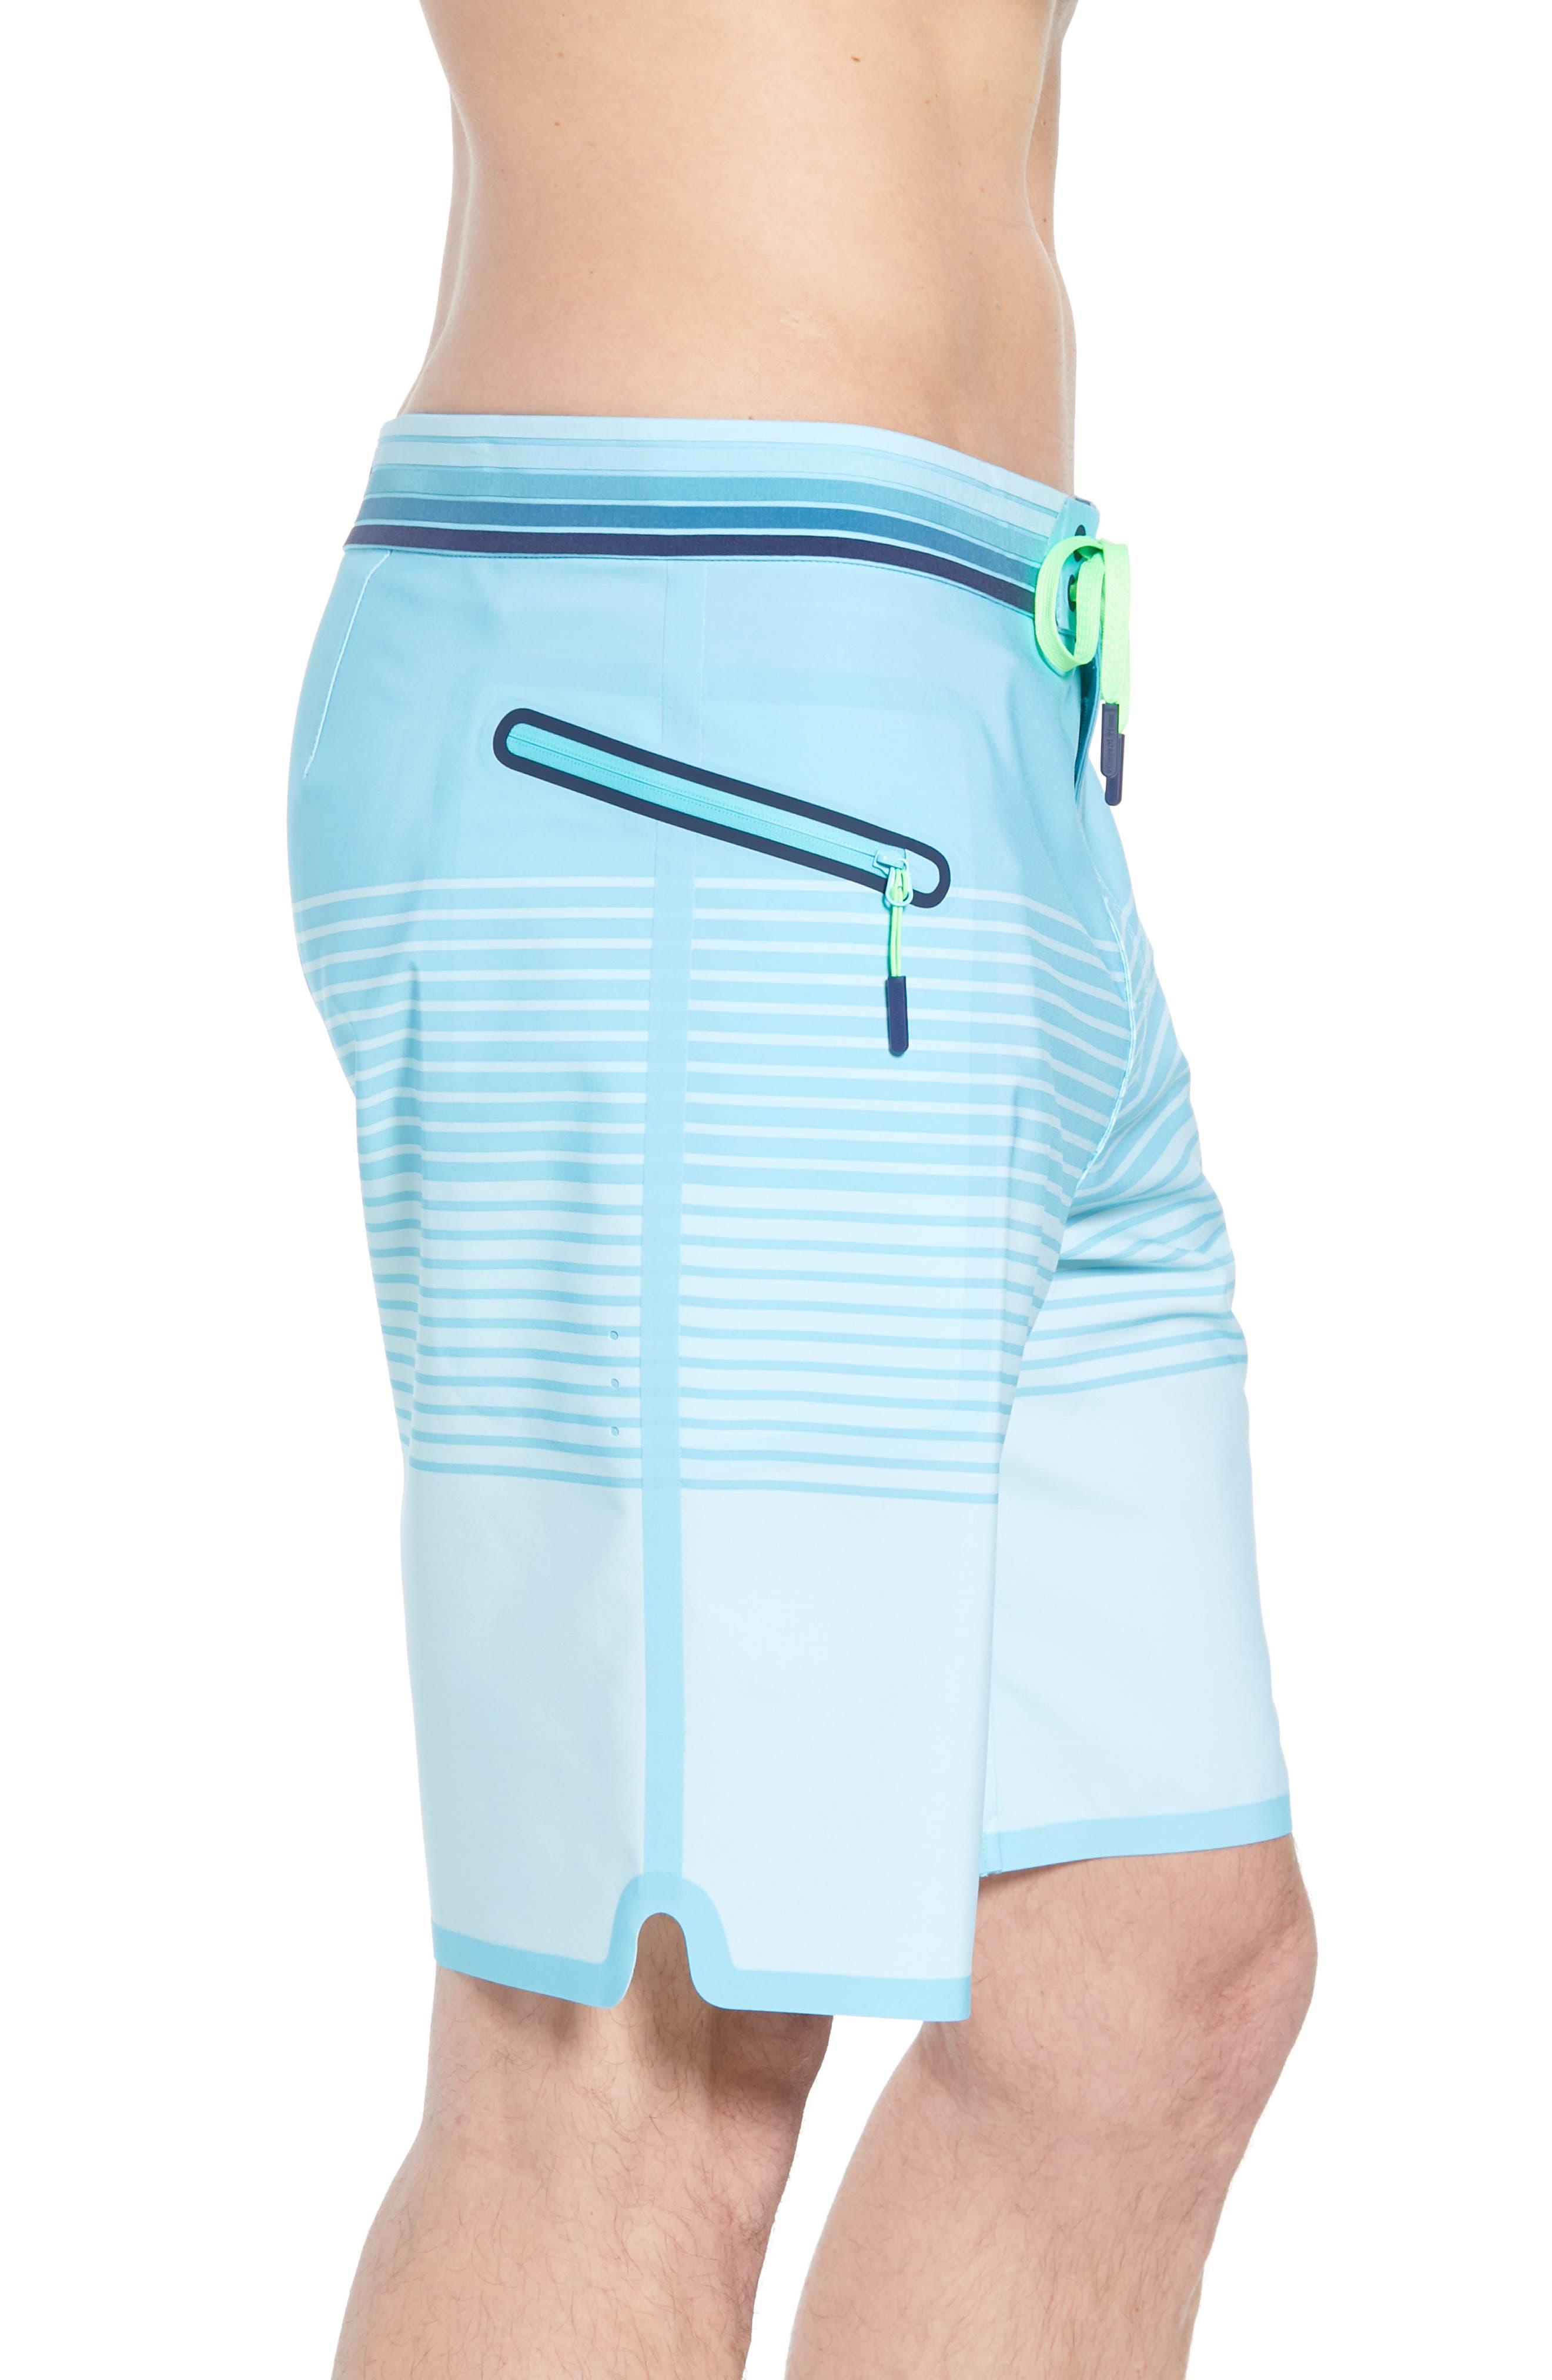 Sculplin Stripe Tech Board Shorts,                             Alternate thumbnail 4, color,                             Turquoise